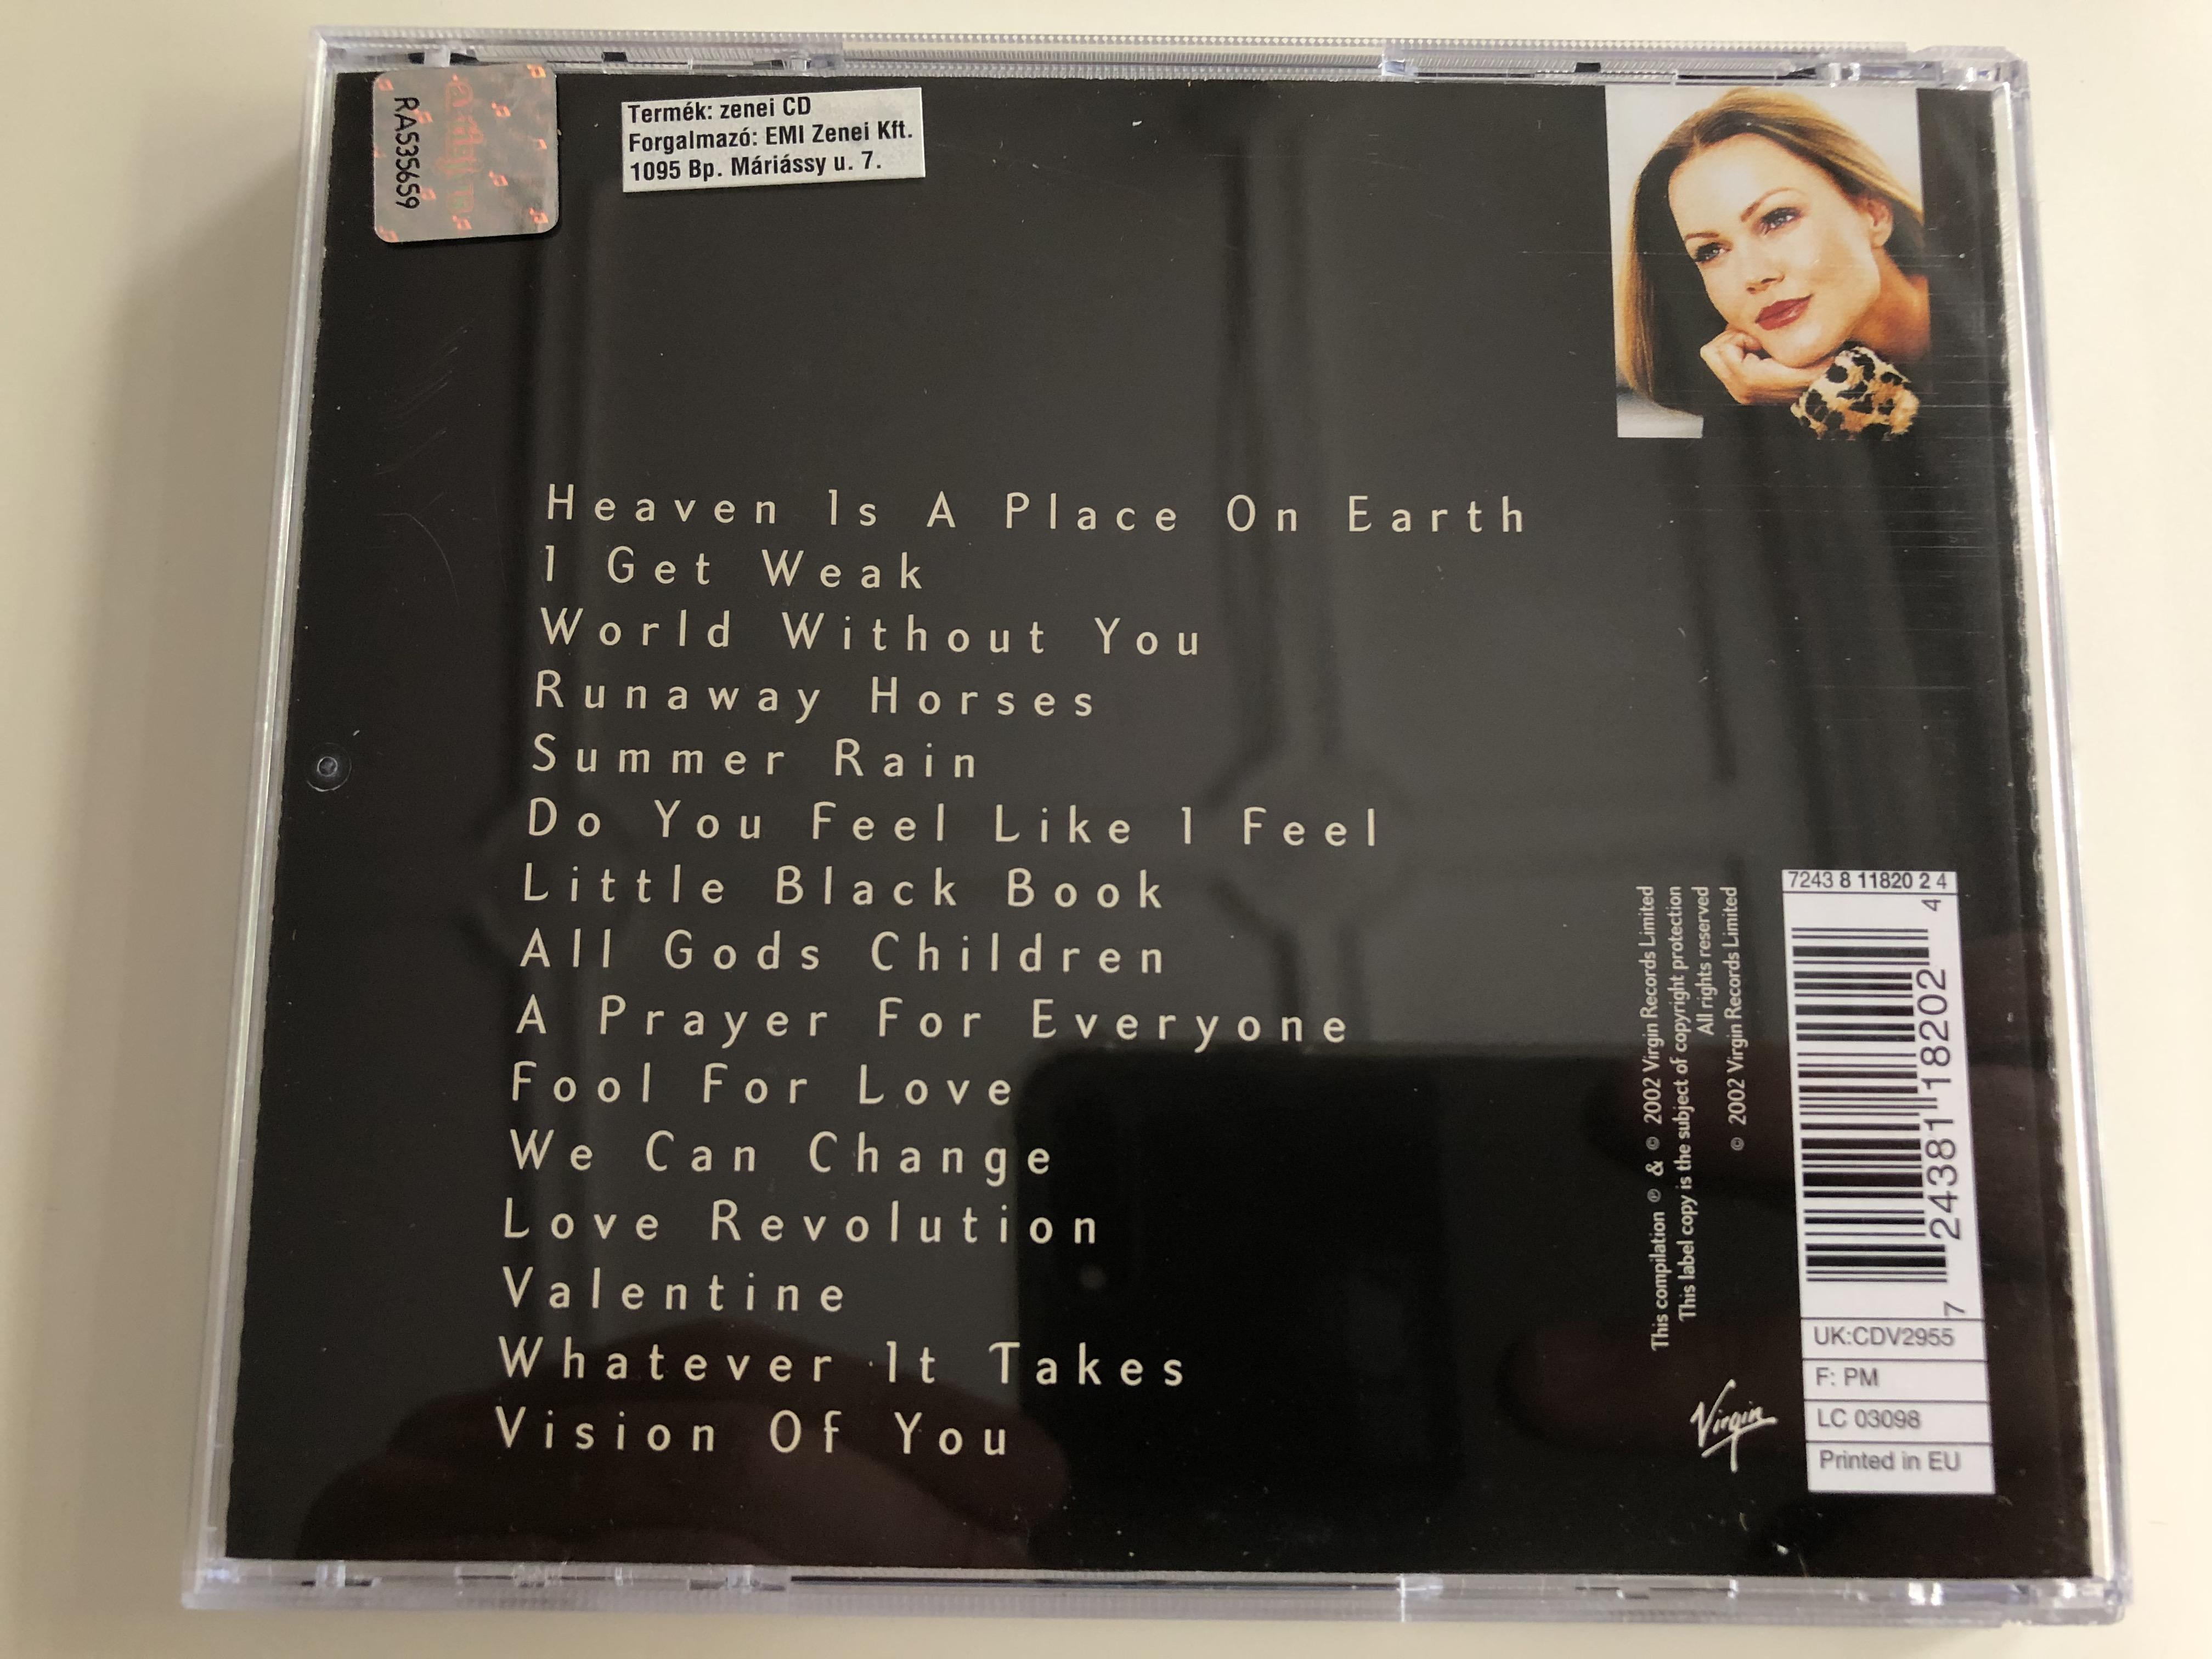 belinda-carlisle-the-collection-virgin-audio-cd-2002-cdv2955-7-.jpg